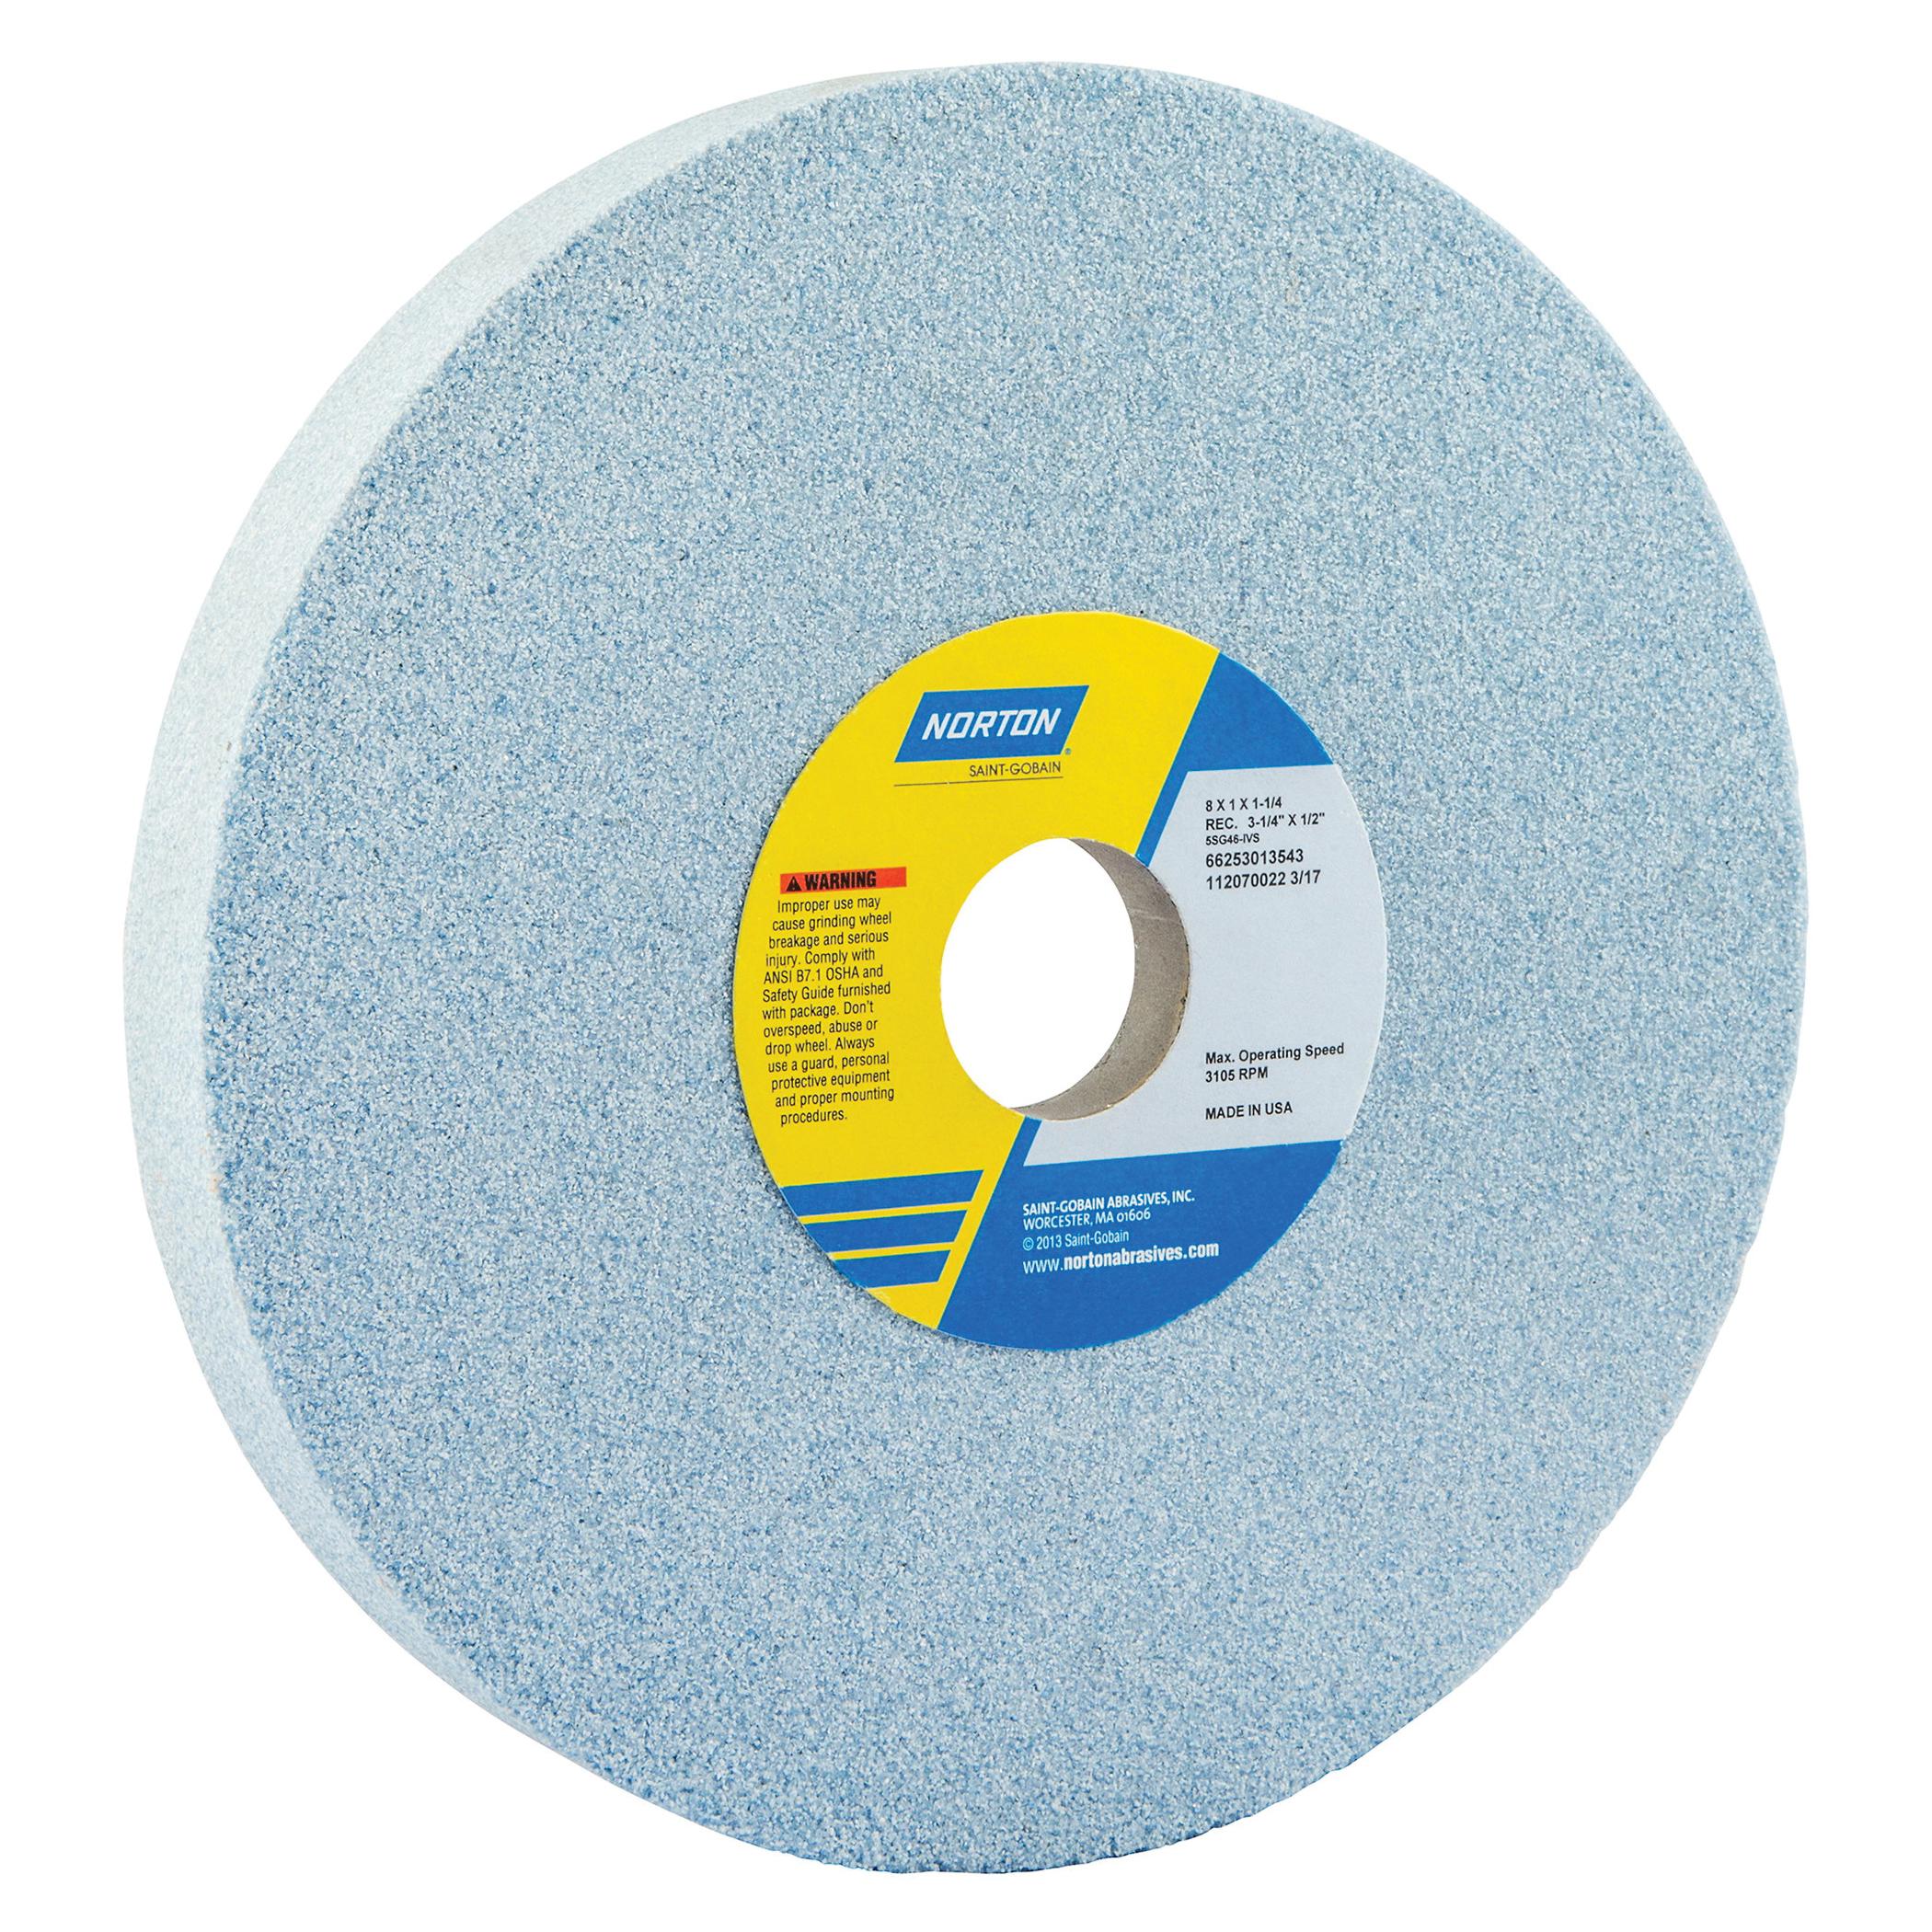 Norton® 66253013543 5SG 1-Side Recessed Toolroom Wheel, 8 in Dia x 1 in THK, 1-1/4 in Center Hole, 46 Grit, Ceramic Alumina/Friable Aluminum Oxide Abrasive